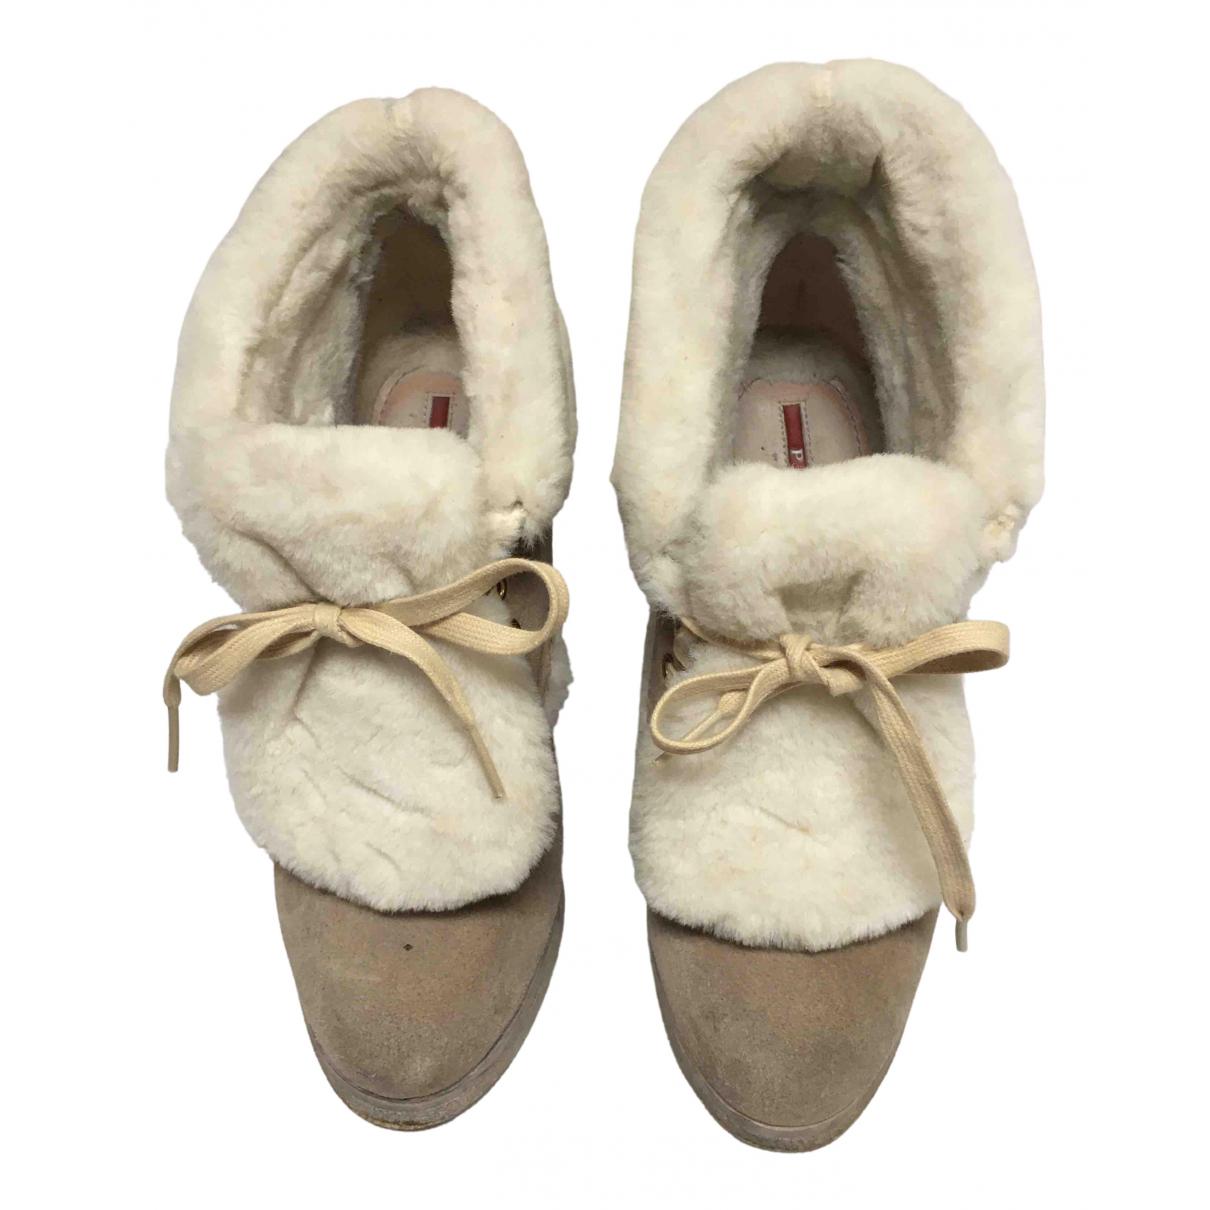 Prada N Beige Suede Ankle boots for Women 36 EU